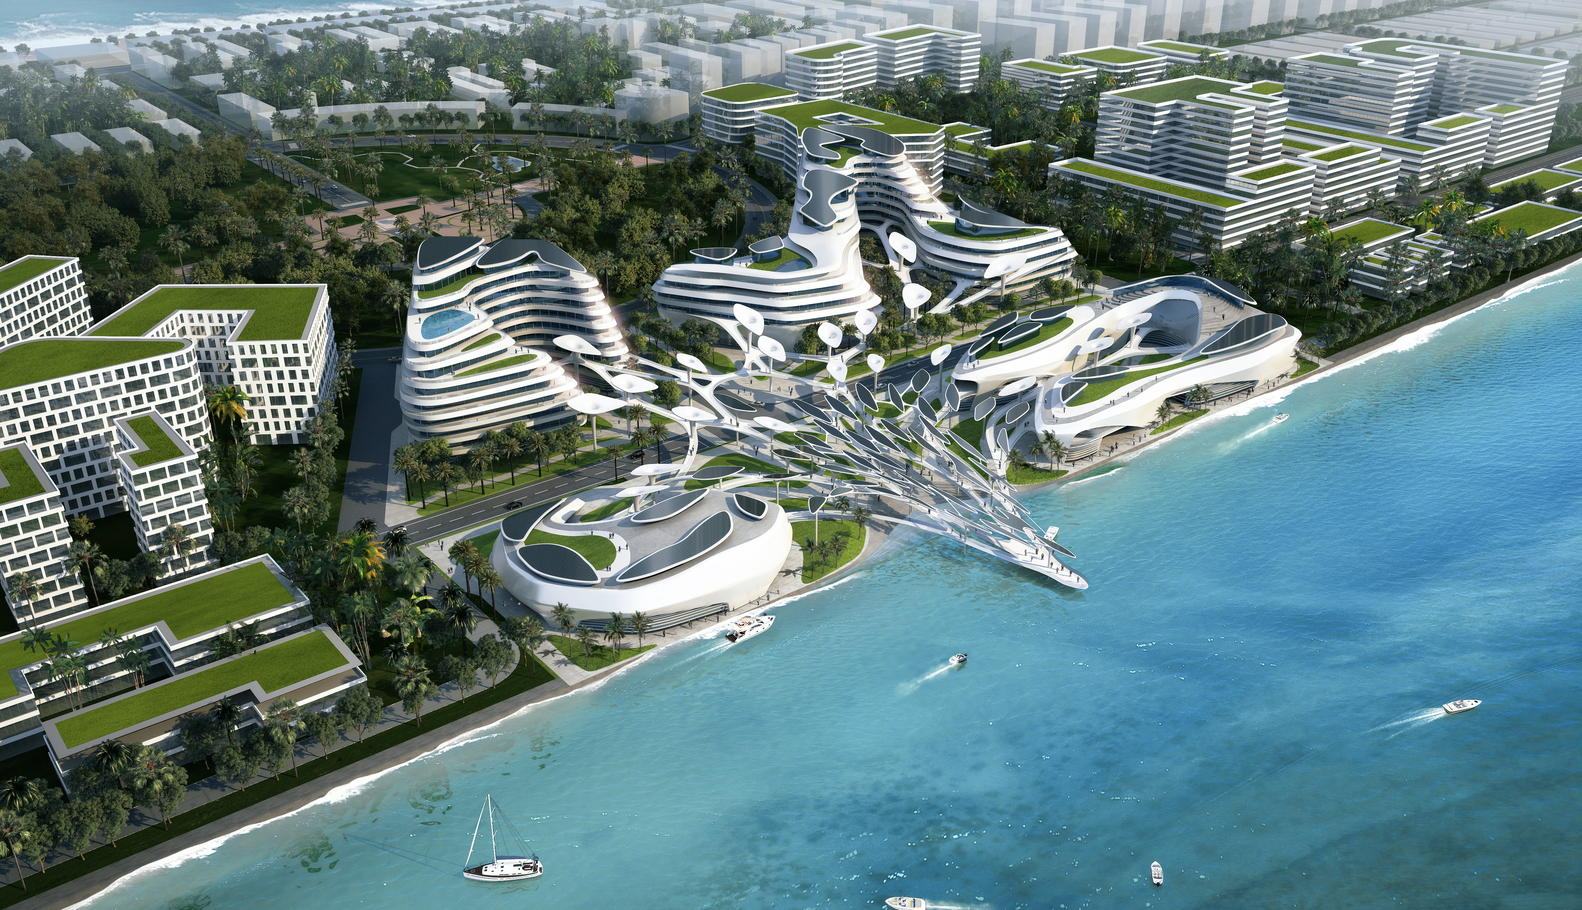 CAA Architects Reveals Futuristic Eco City Design For The MaldivesOceans Heaven Image